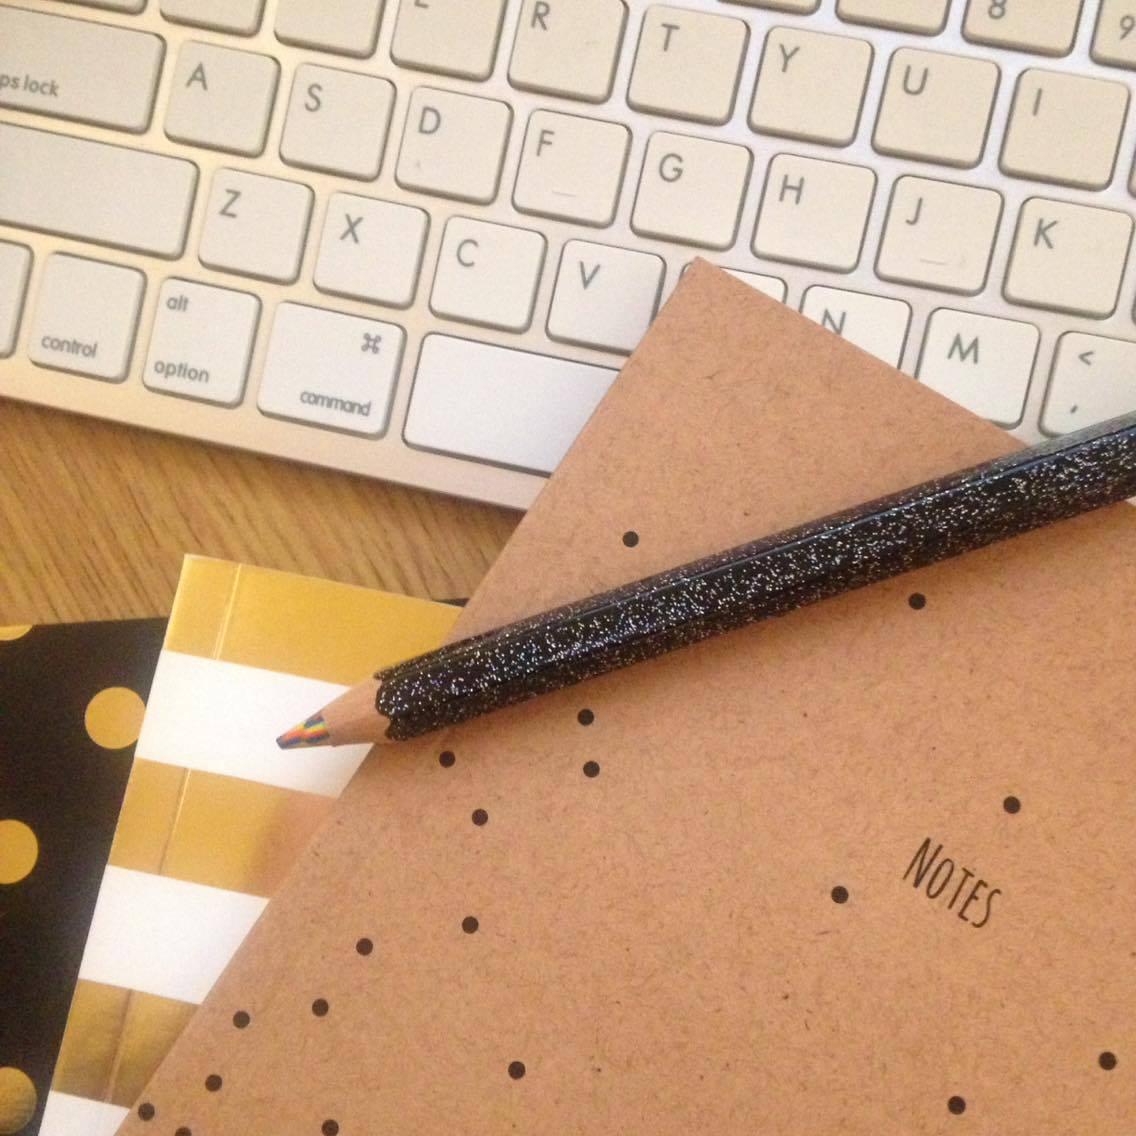 notebookstack.jpg